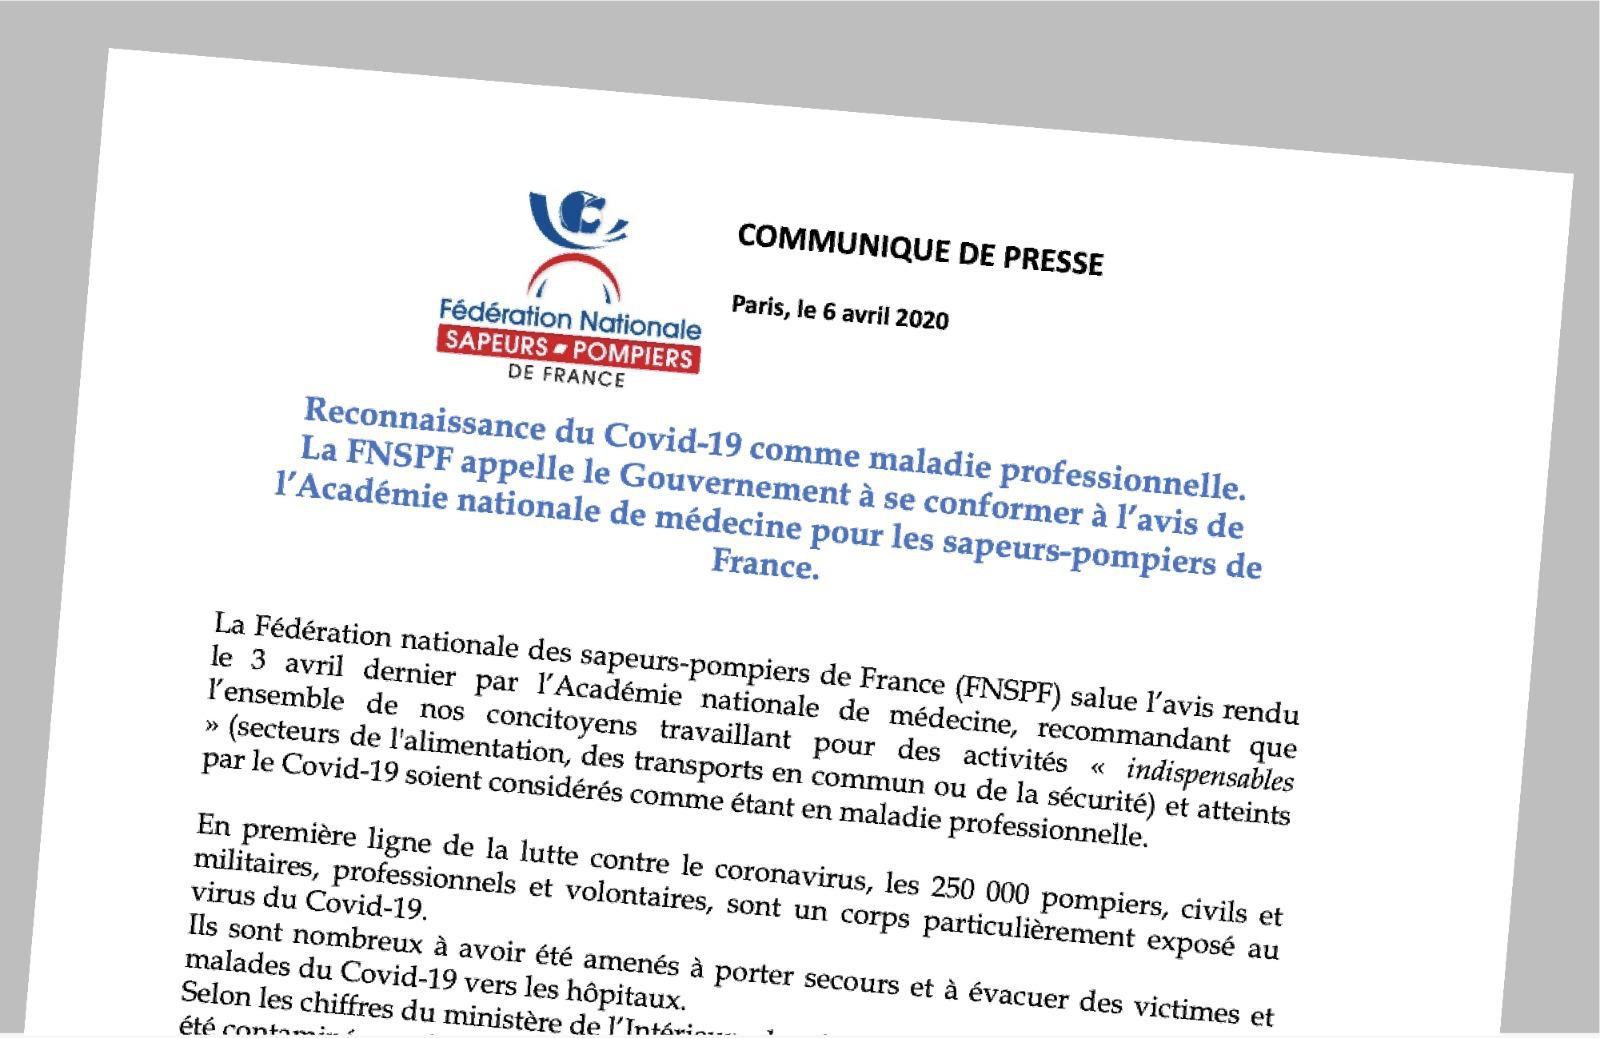 Pompiers de France-FNSPF-CP-Covid-19-Maladie pro